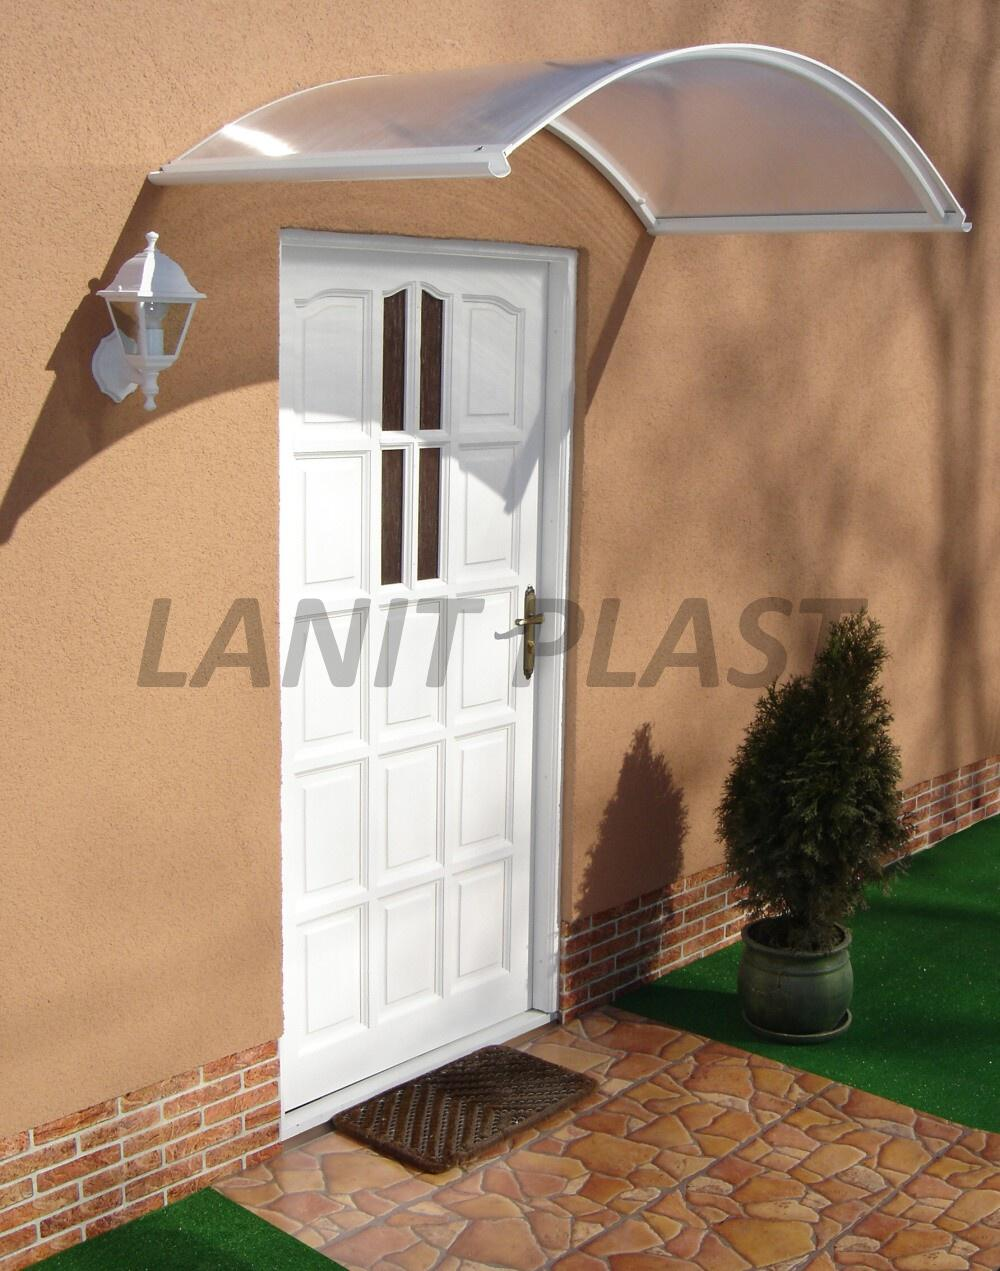 Vchodová stříška LANITPLAST ARCUS 160/70 bílá